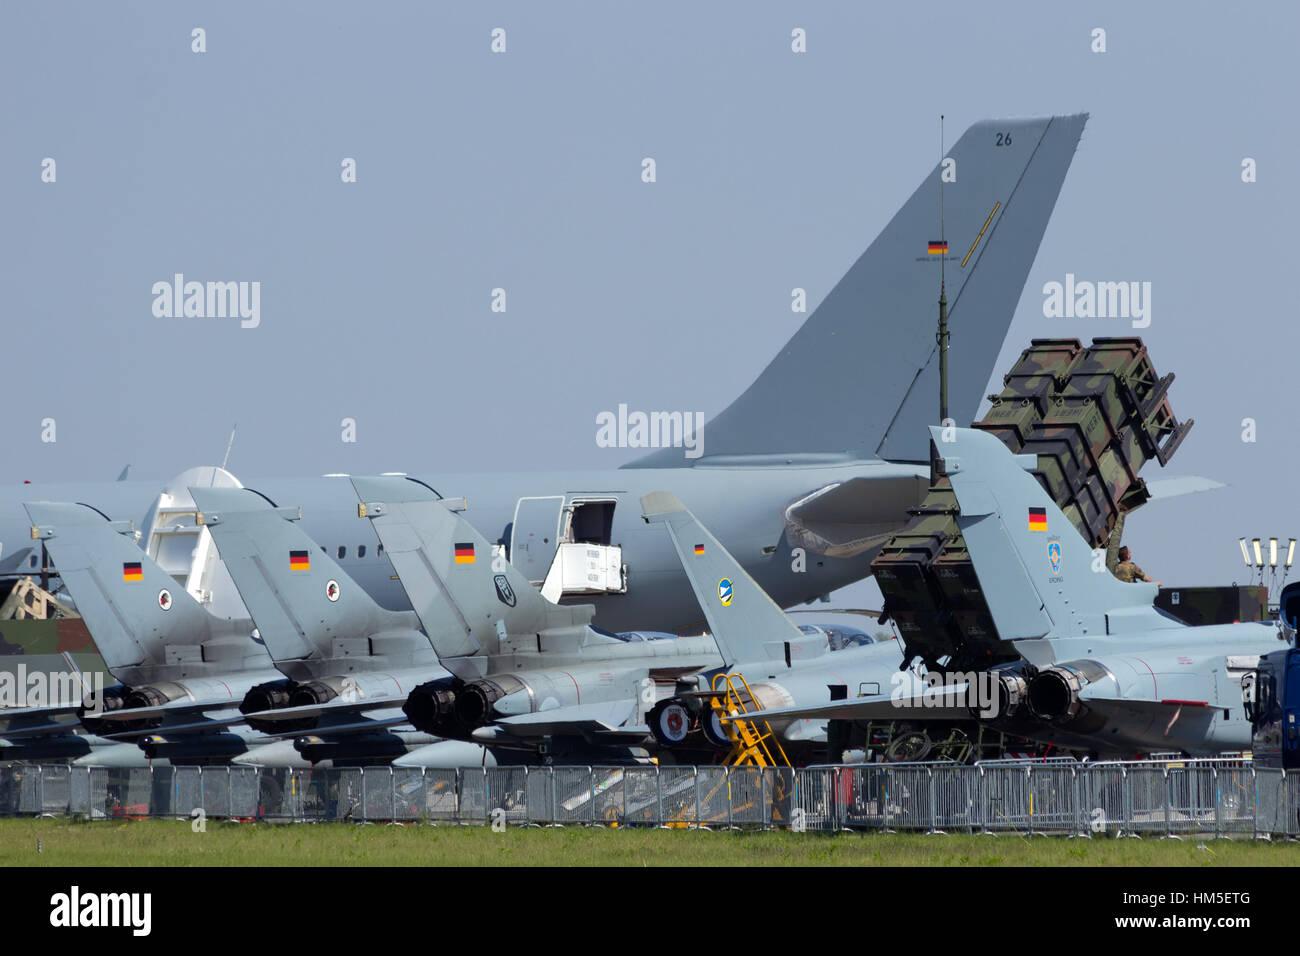 BERLIN, GERMANY MAY 22: German Air Force planes at the